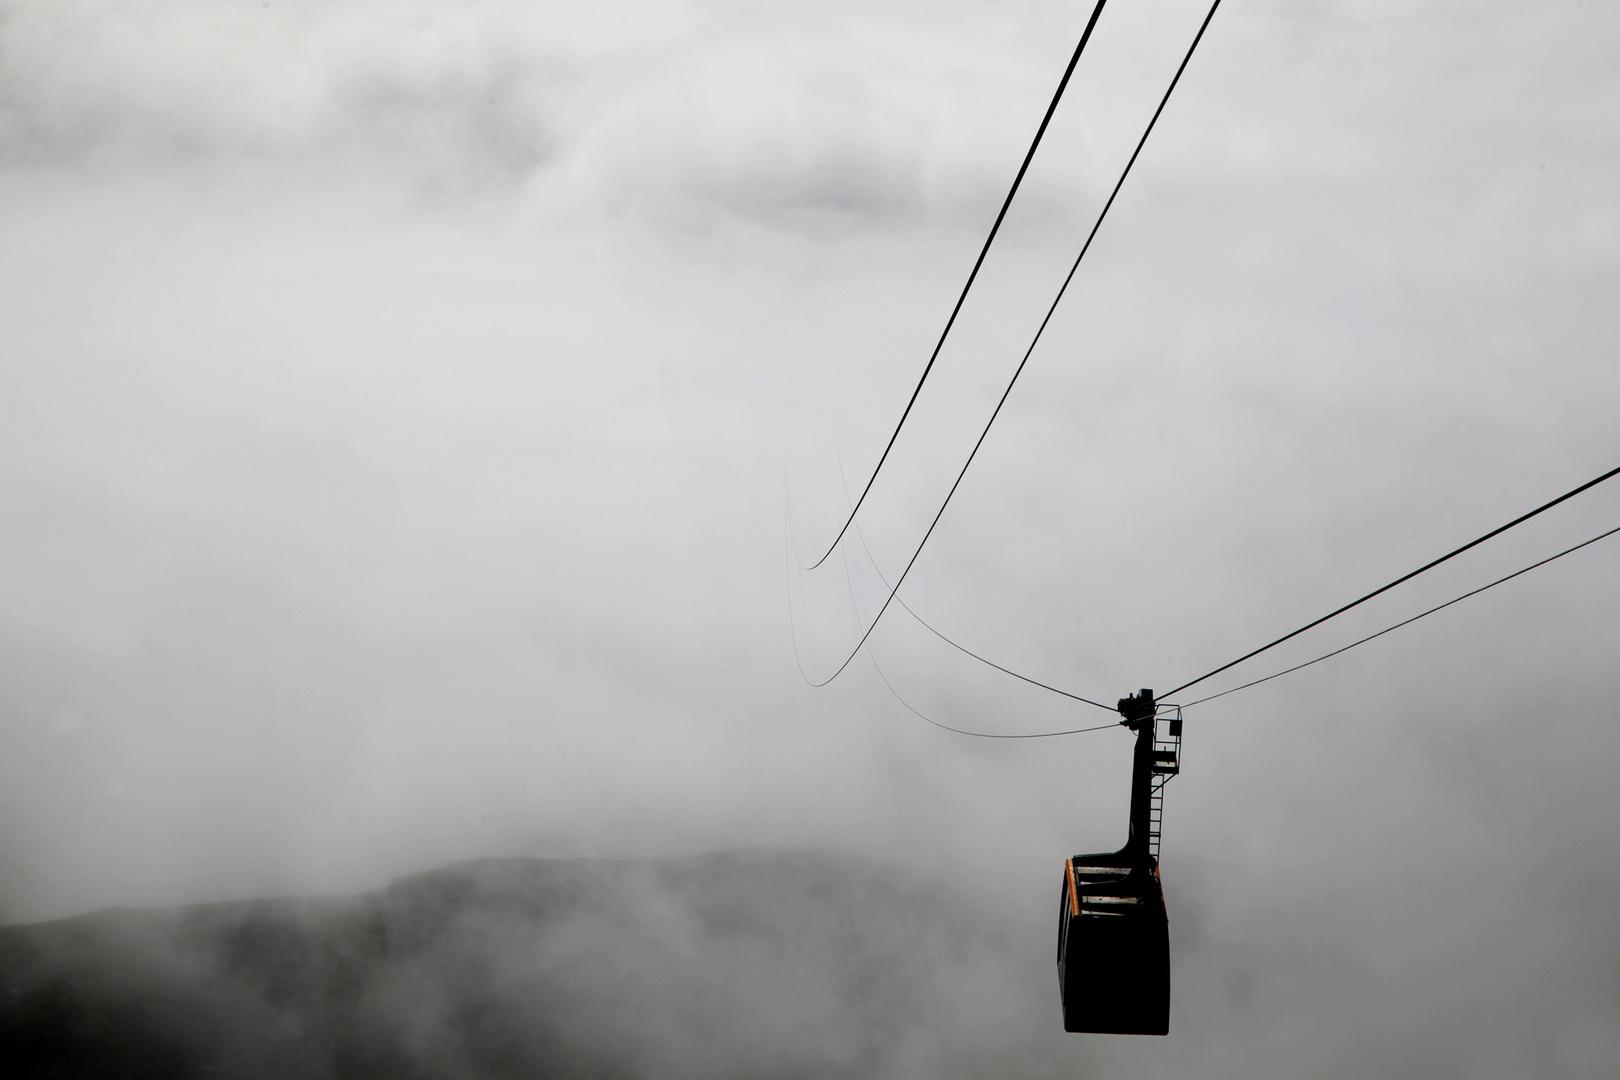 Weg aus dem Nebel